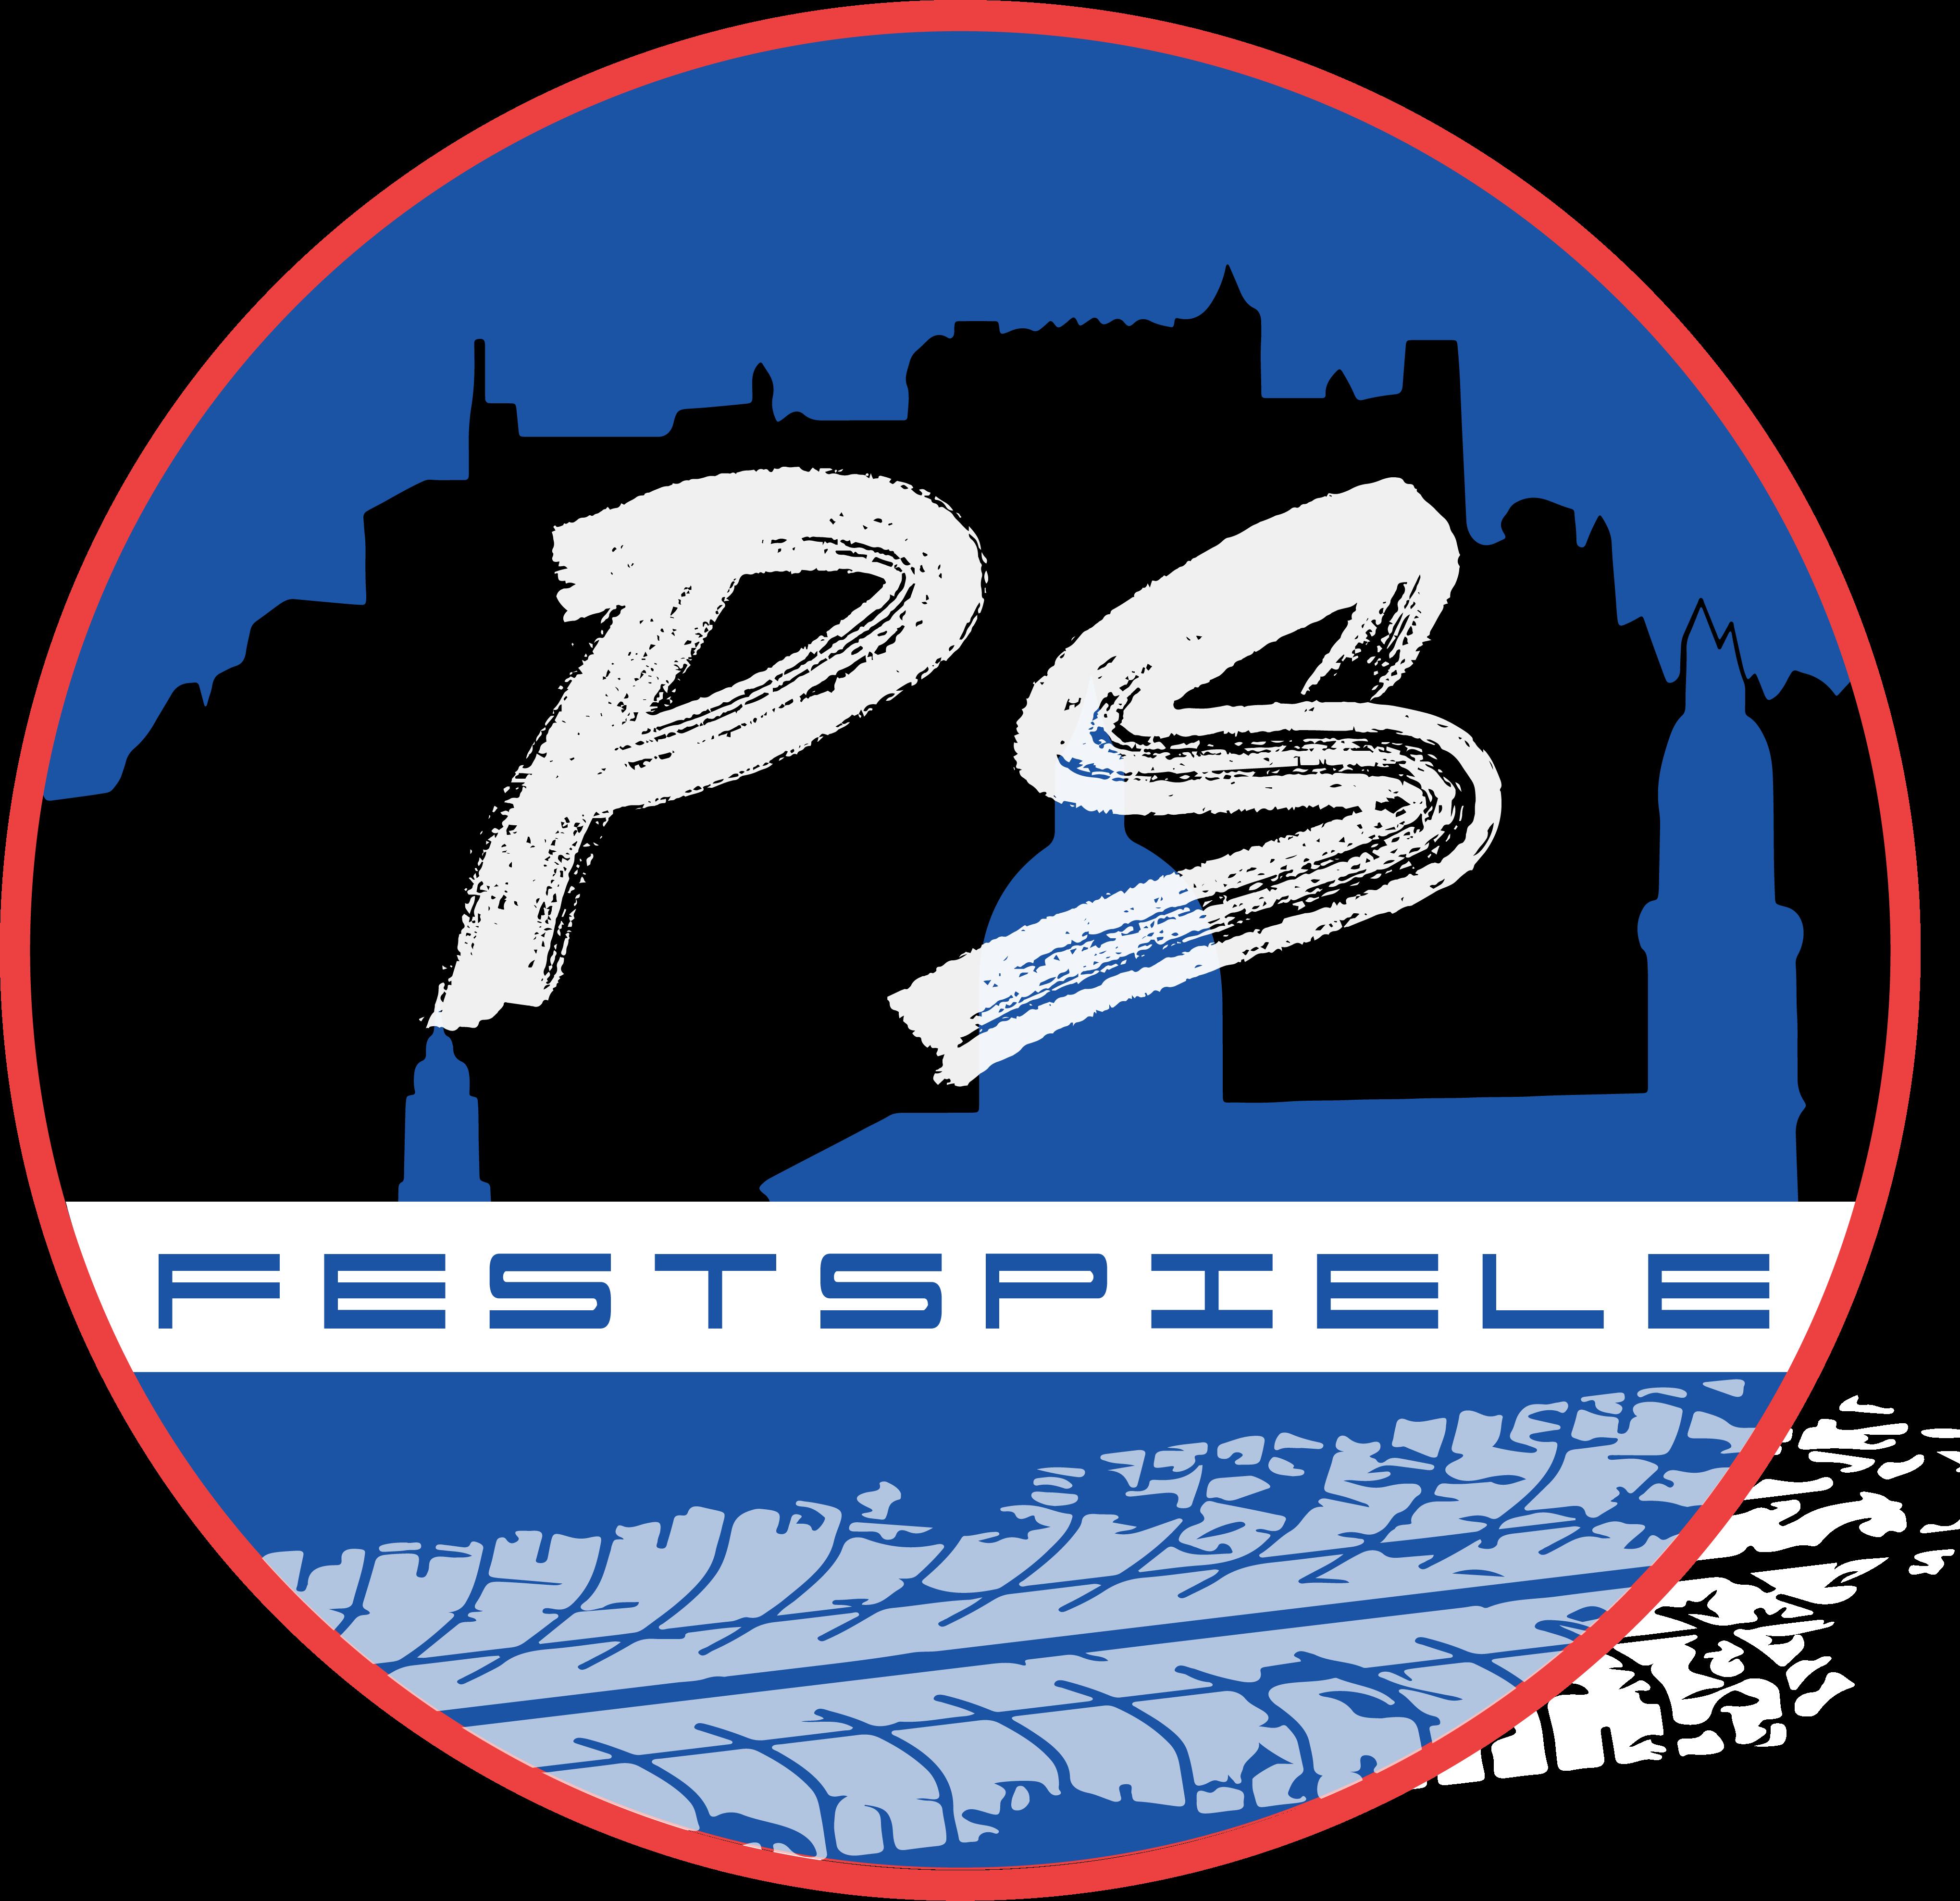 PS Festspiele Logo